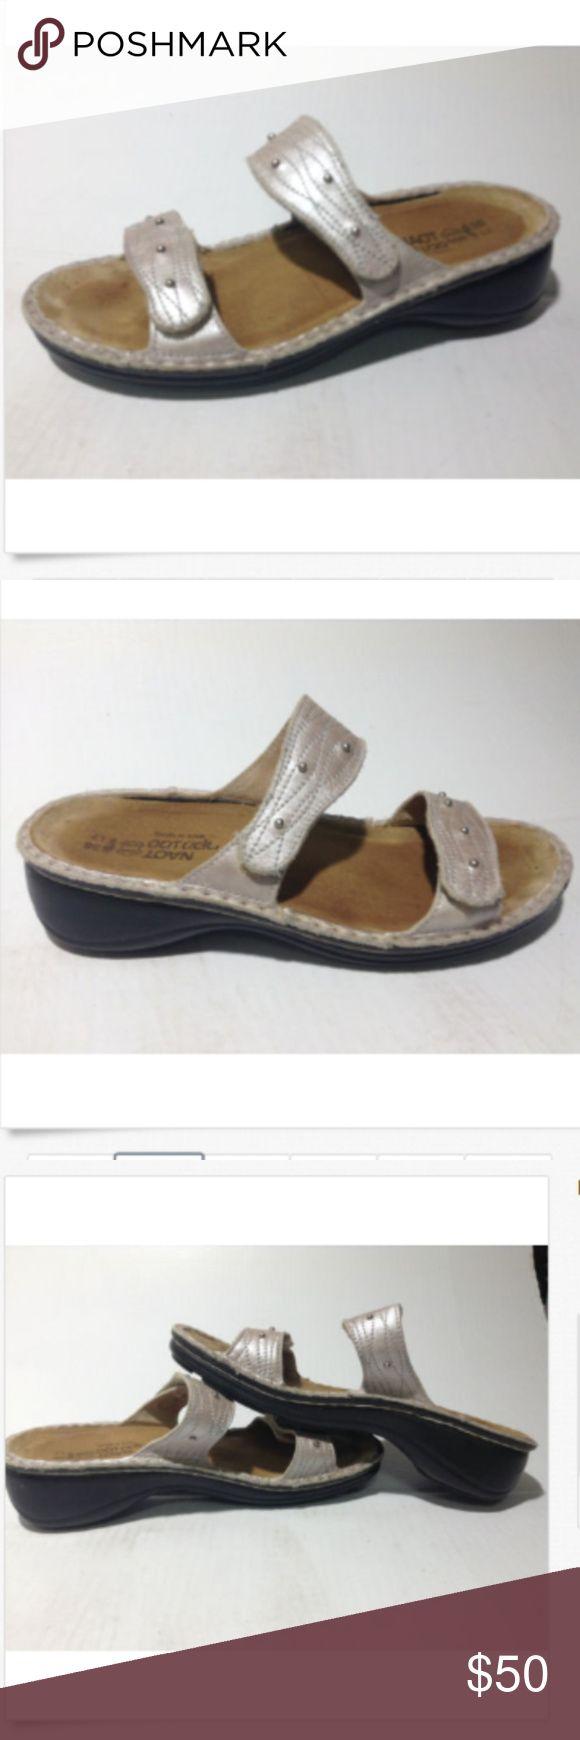 NAOT Shimmery Pewter Sandals Adjustable 7 38 NAOT shimmery pewter Sandals with adjustable straps size 7 US 38 EU NAOT Shoes Sandals